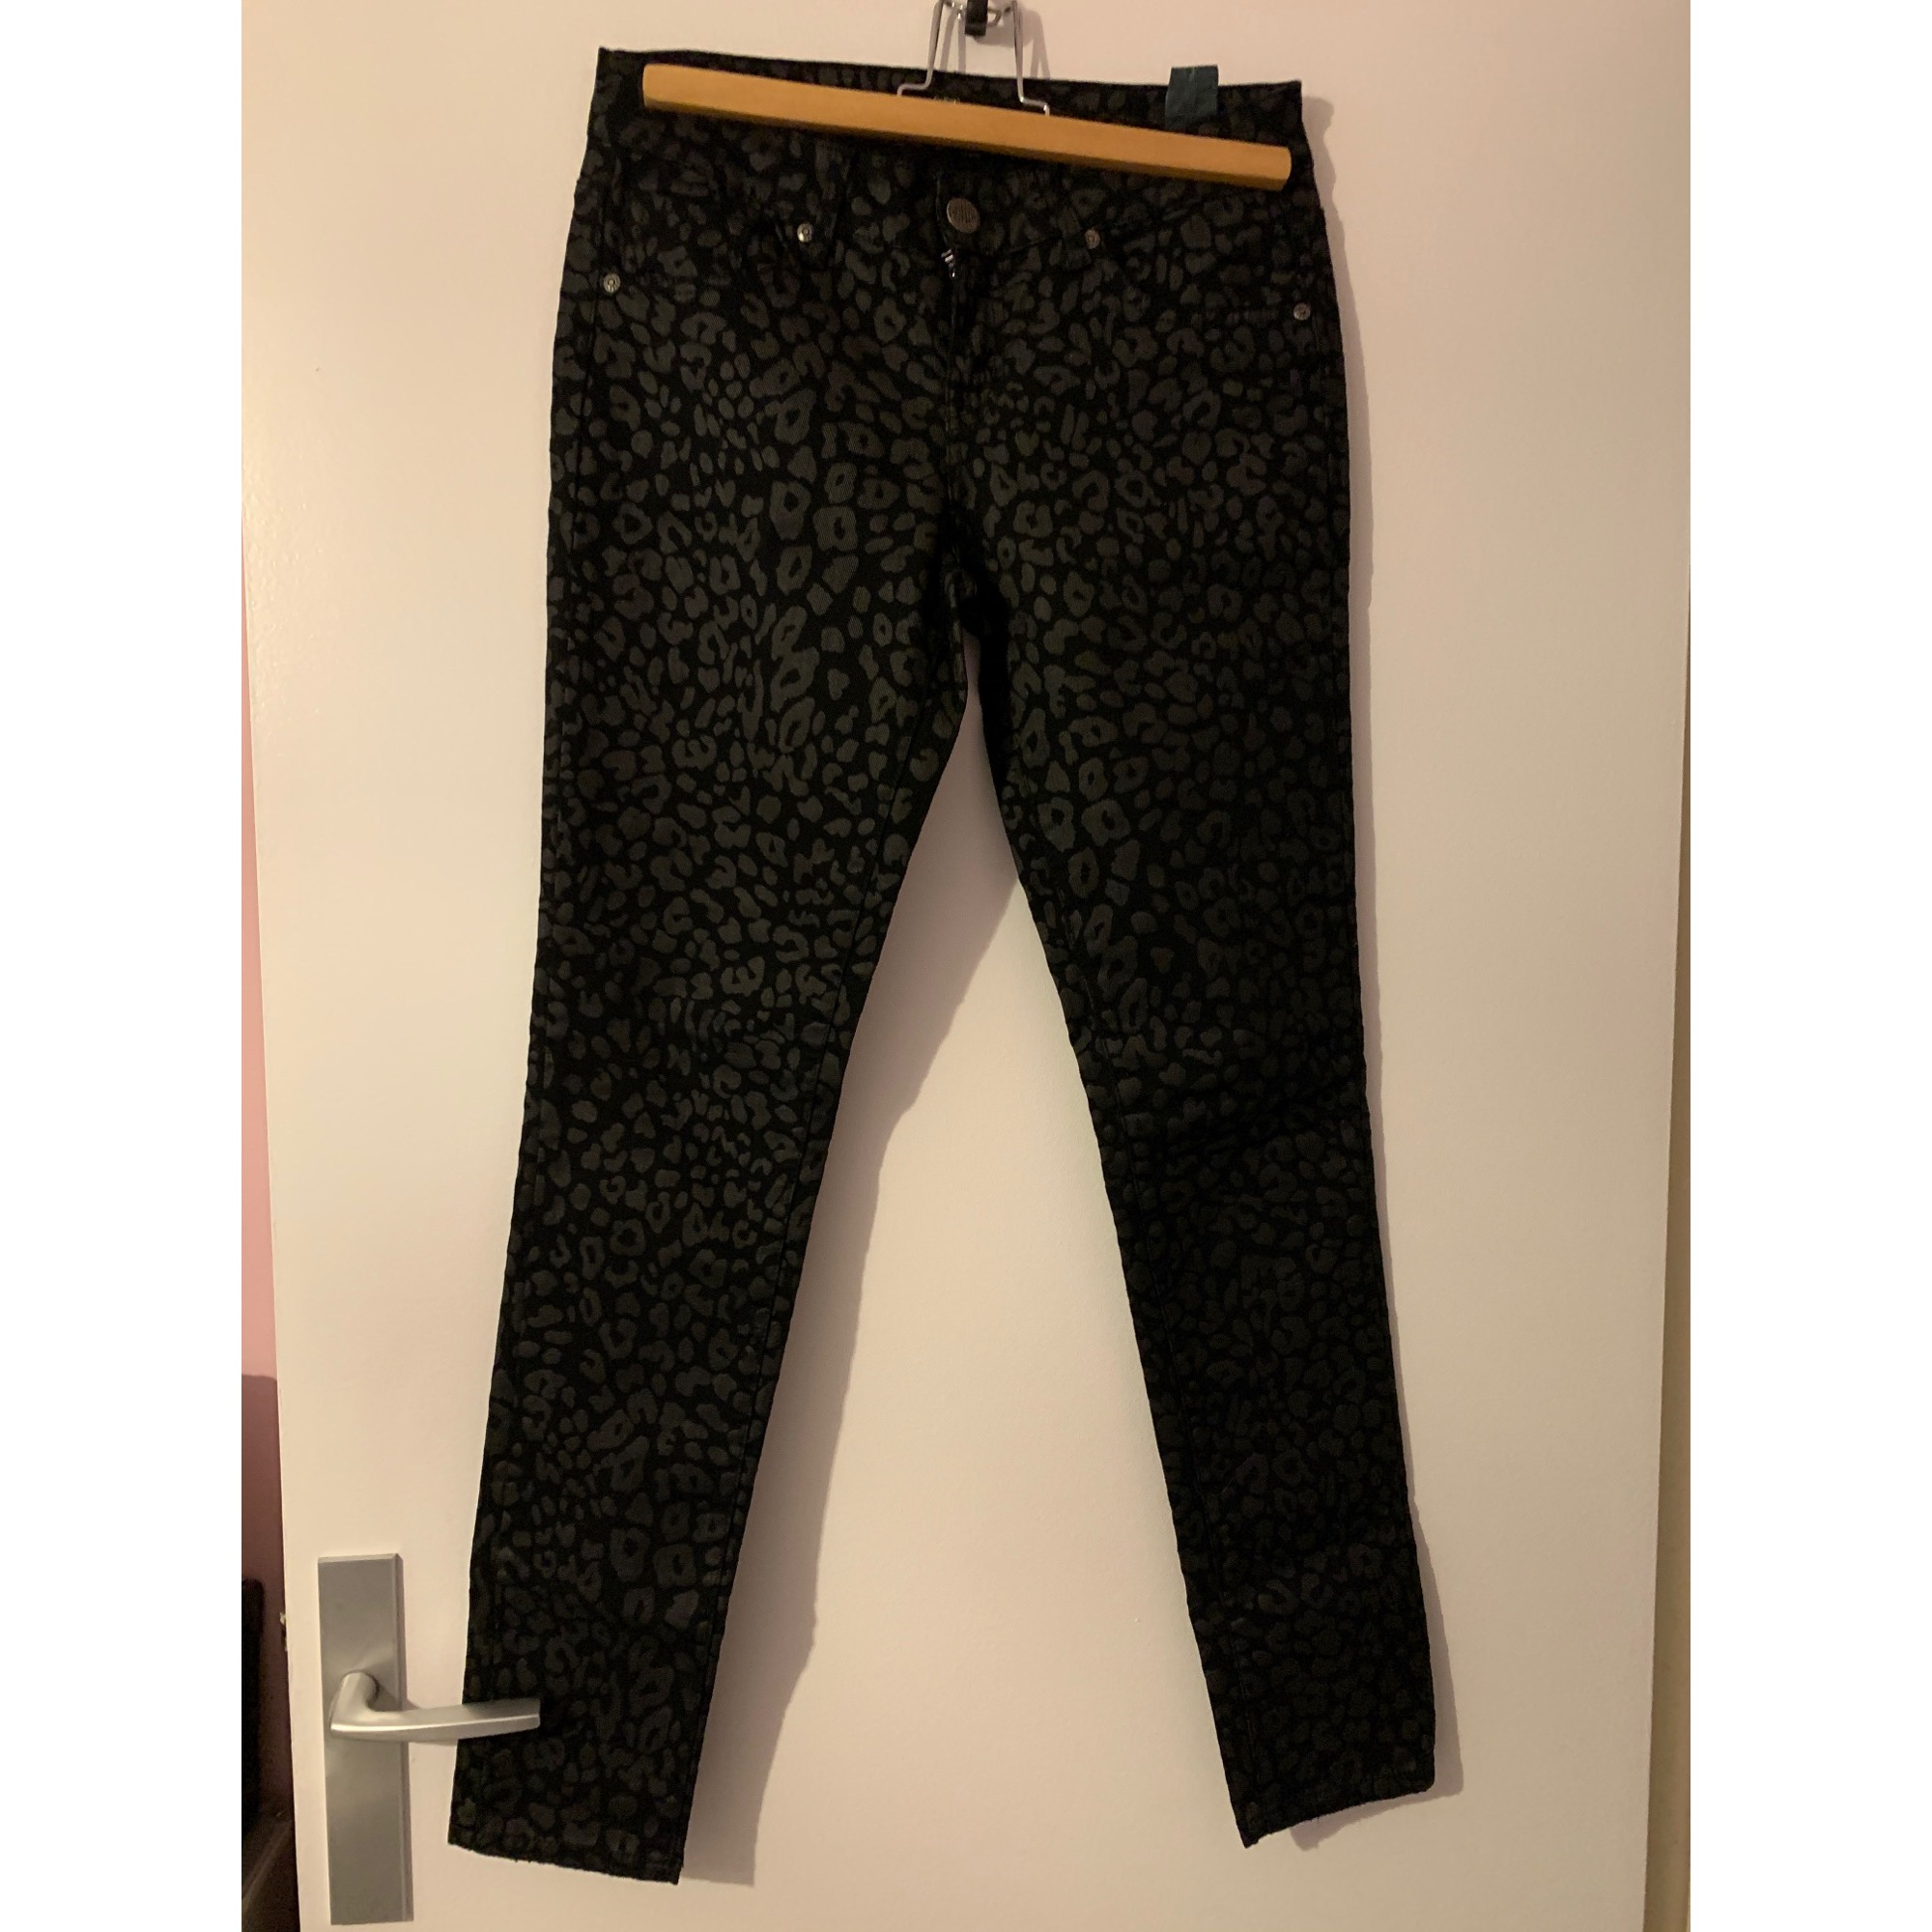 Pantalon slim, cigarette CIMARRON Imprimés animaliers